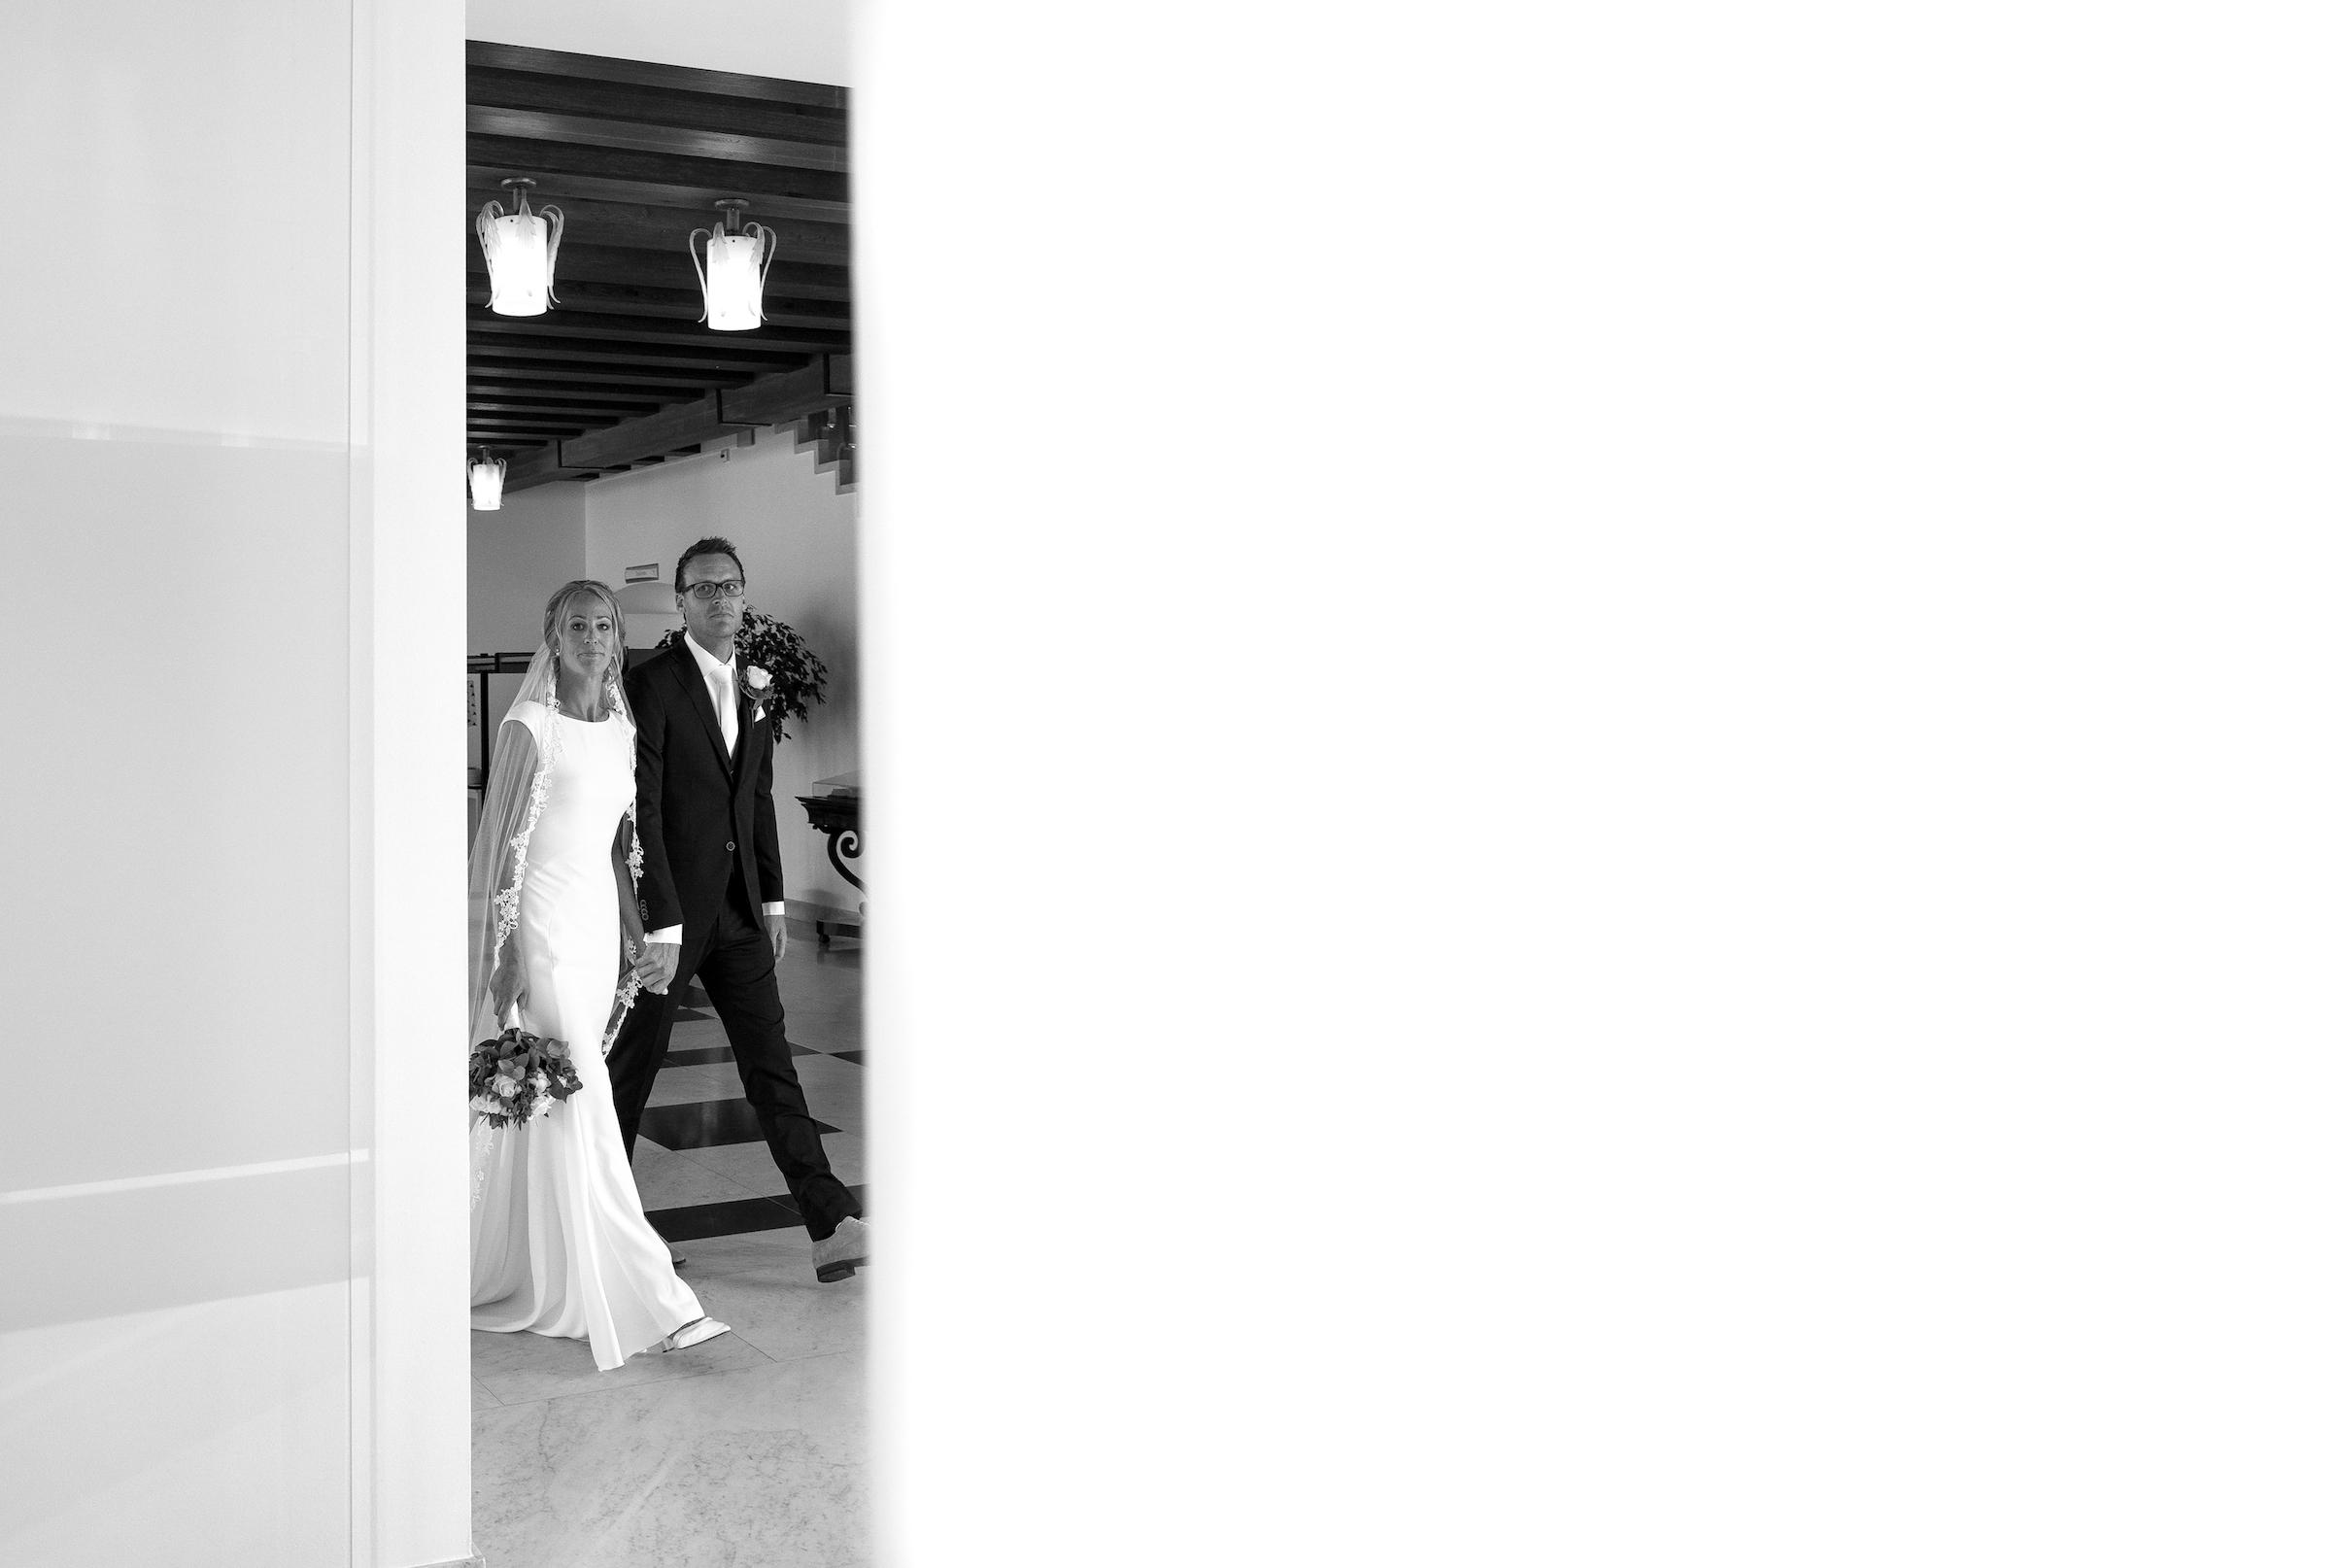 Bruidsfotografie Rianne Veldman 3